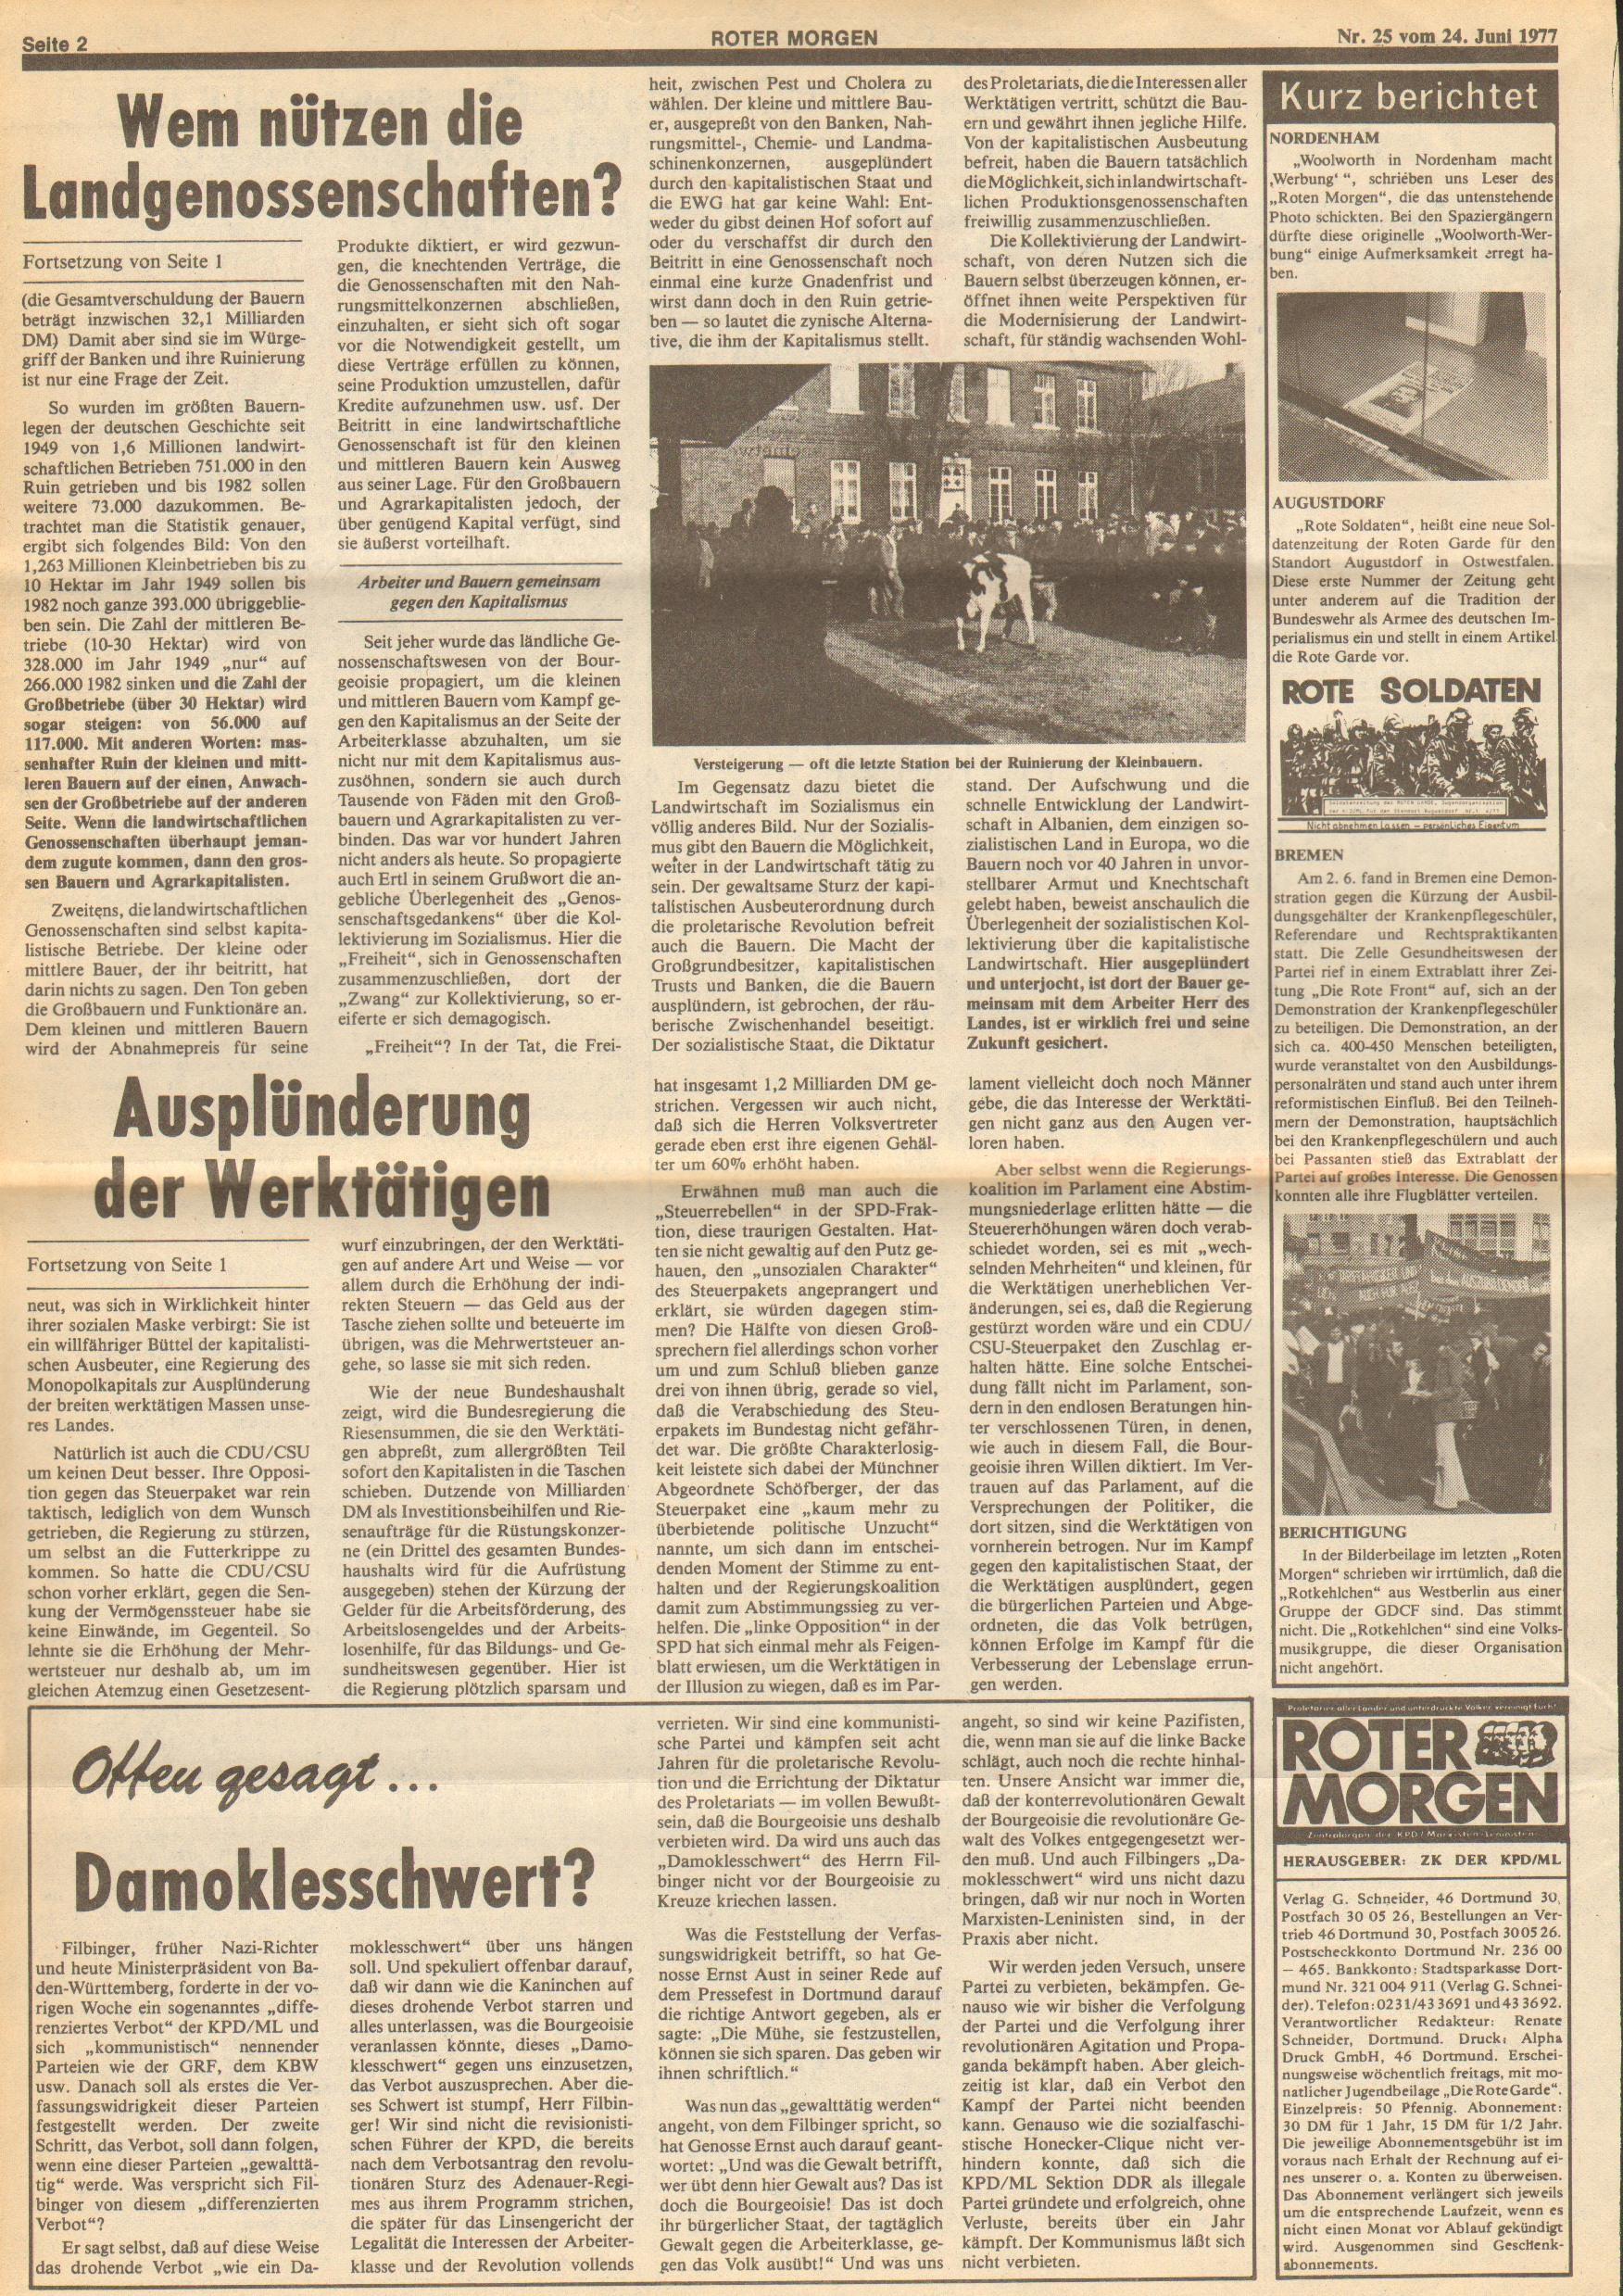 Roter Morgen, 11. Jg., 24. Juni 1977, Nr. 25, Seite 2